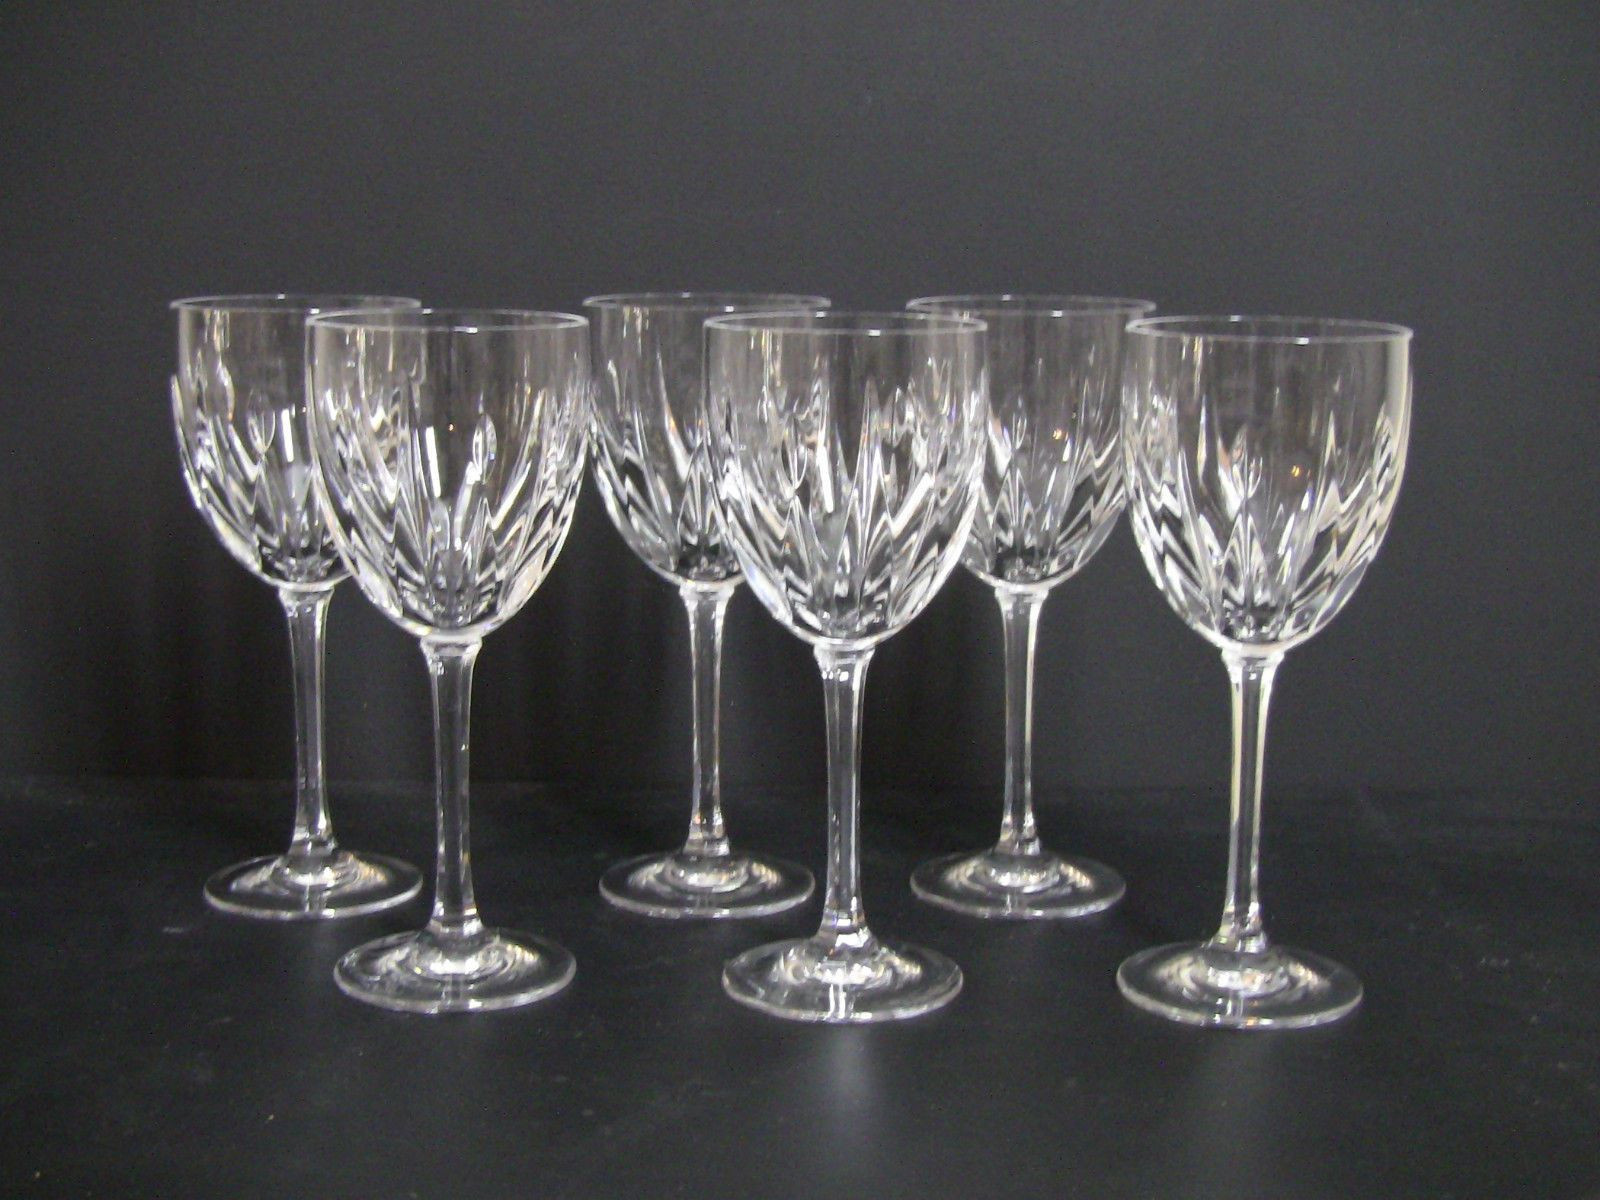 gorham lady anne crystal bud vase of gorham bellevue water goblet 166907 crystal wine glasses gorham in gorham bellevue water goblet 166907 crystal wine glasses